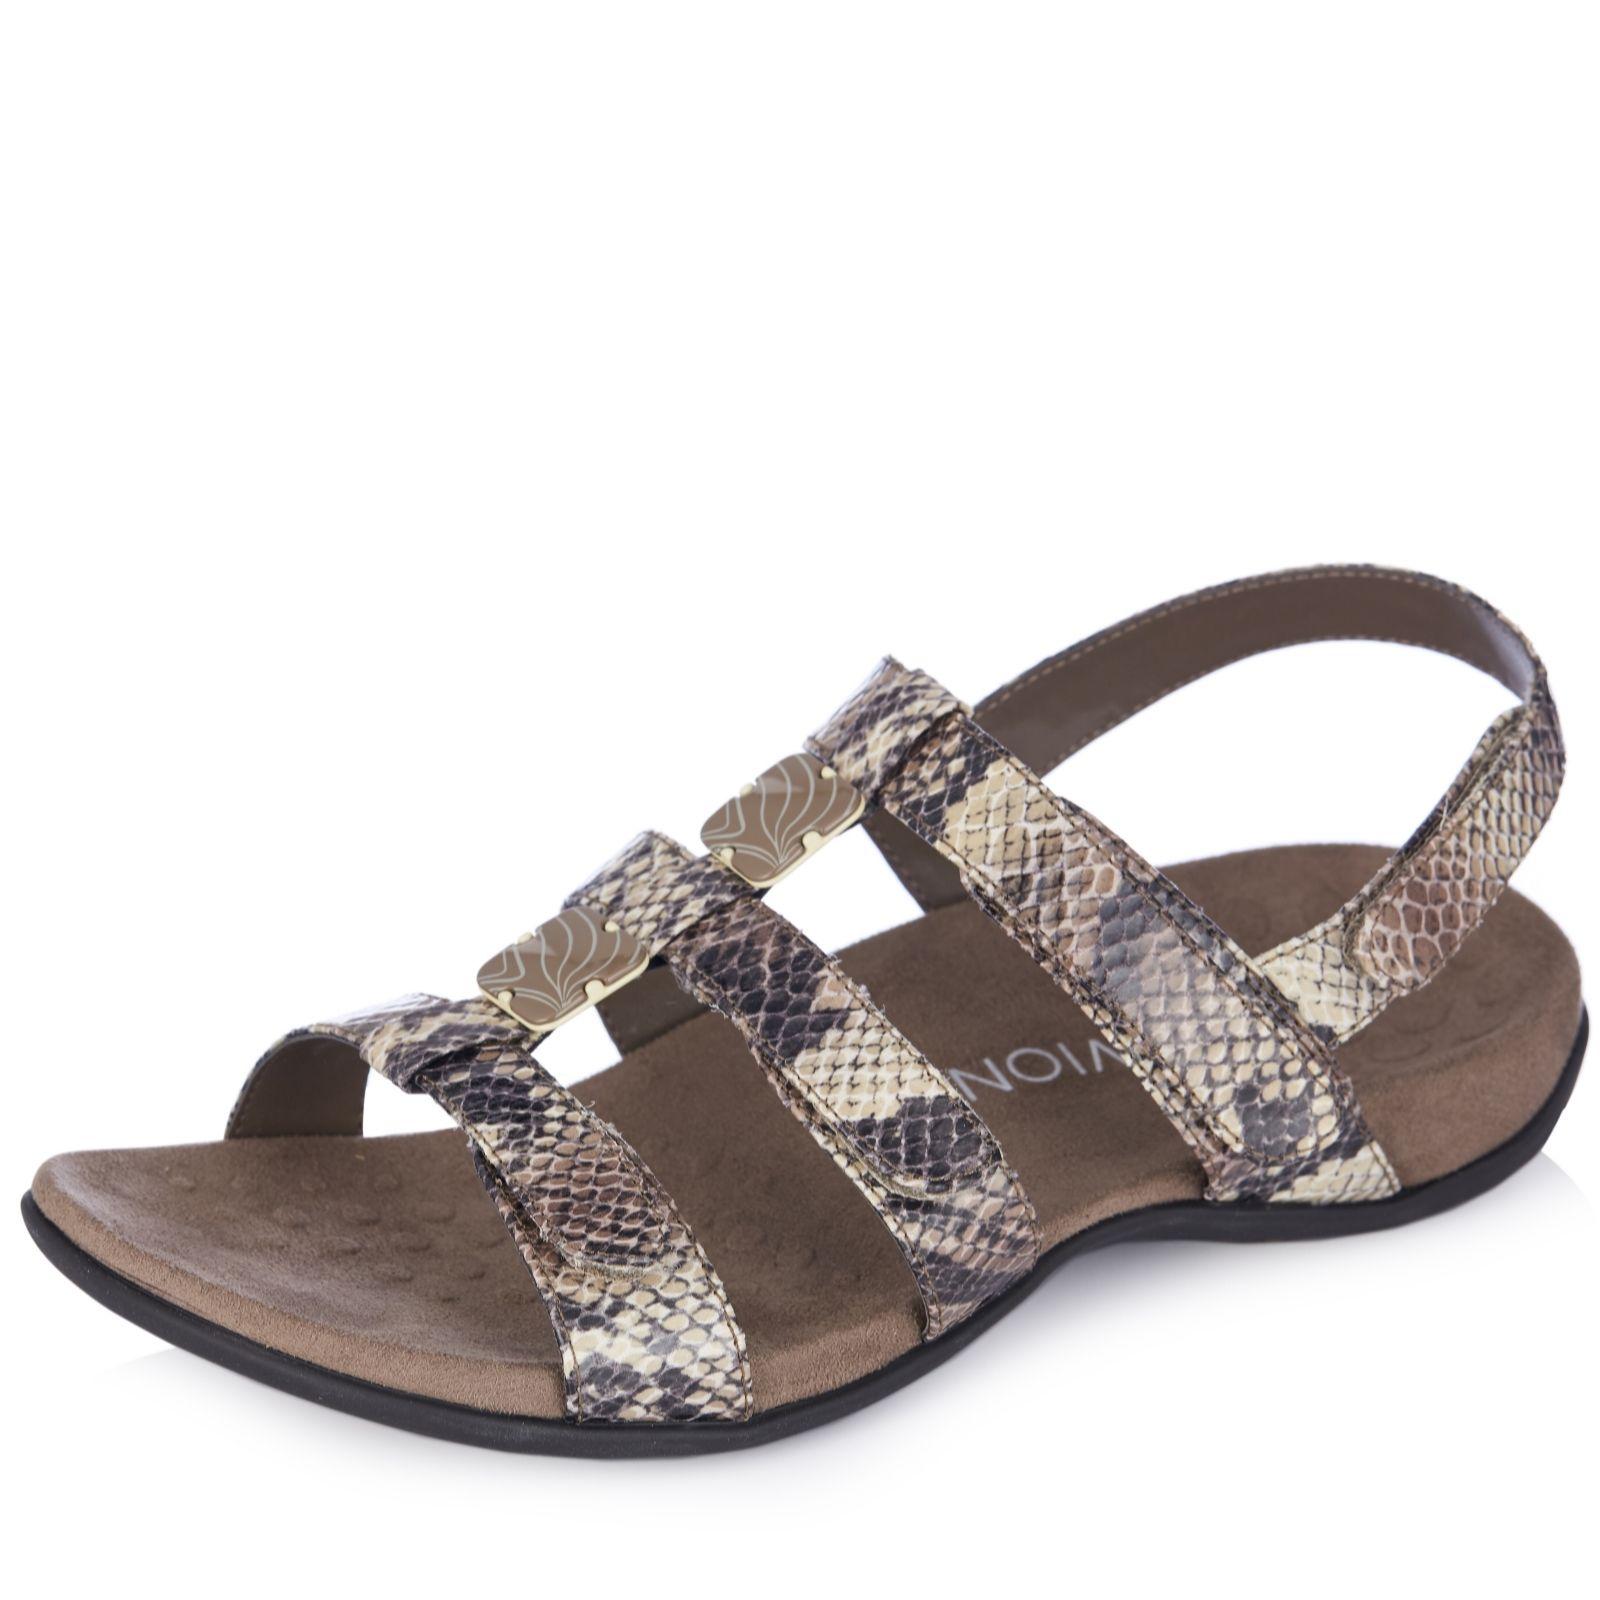 quite nice wide range recognized brands Vionic Orthotic Rest Amber Adjustable Sandal with FMT Technology ...